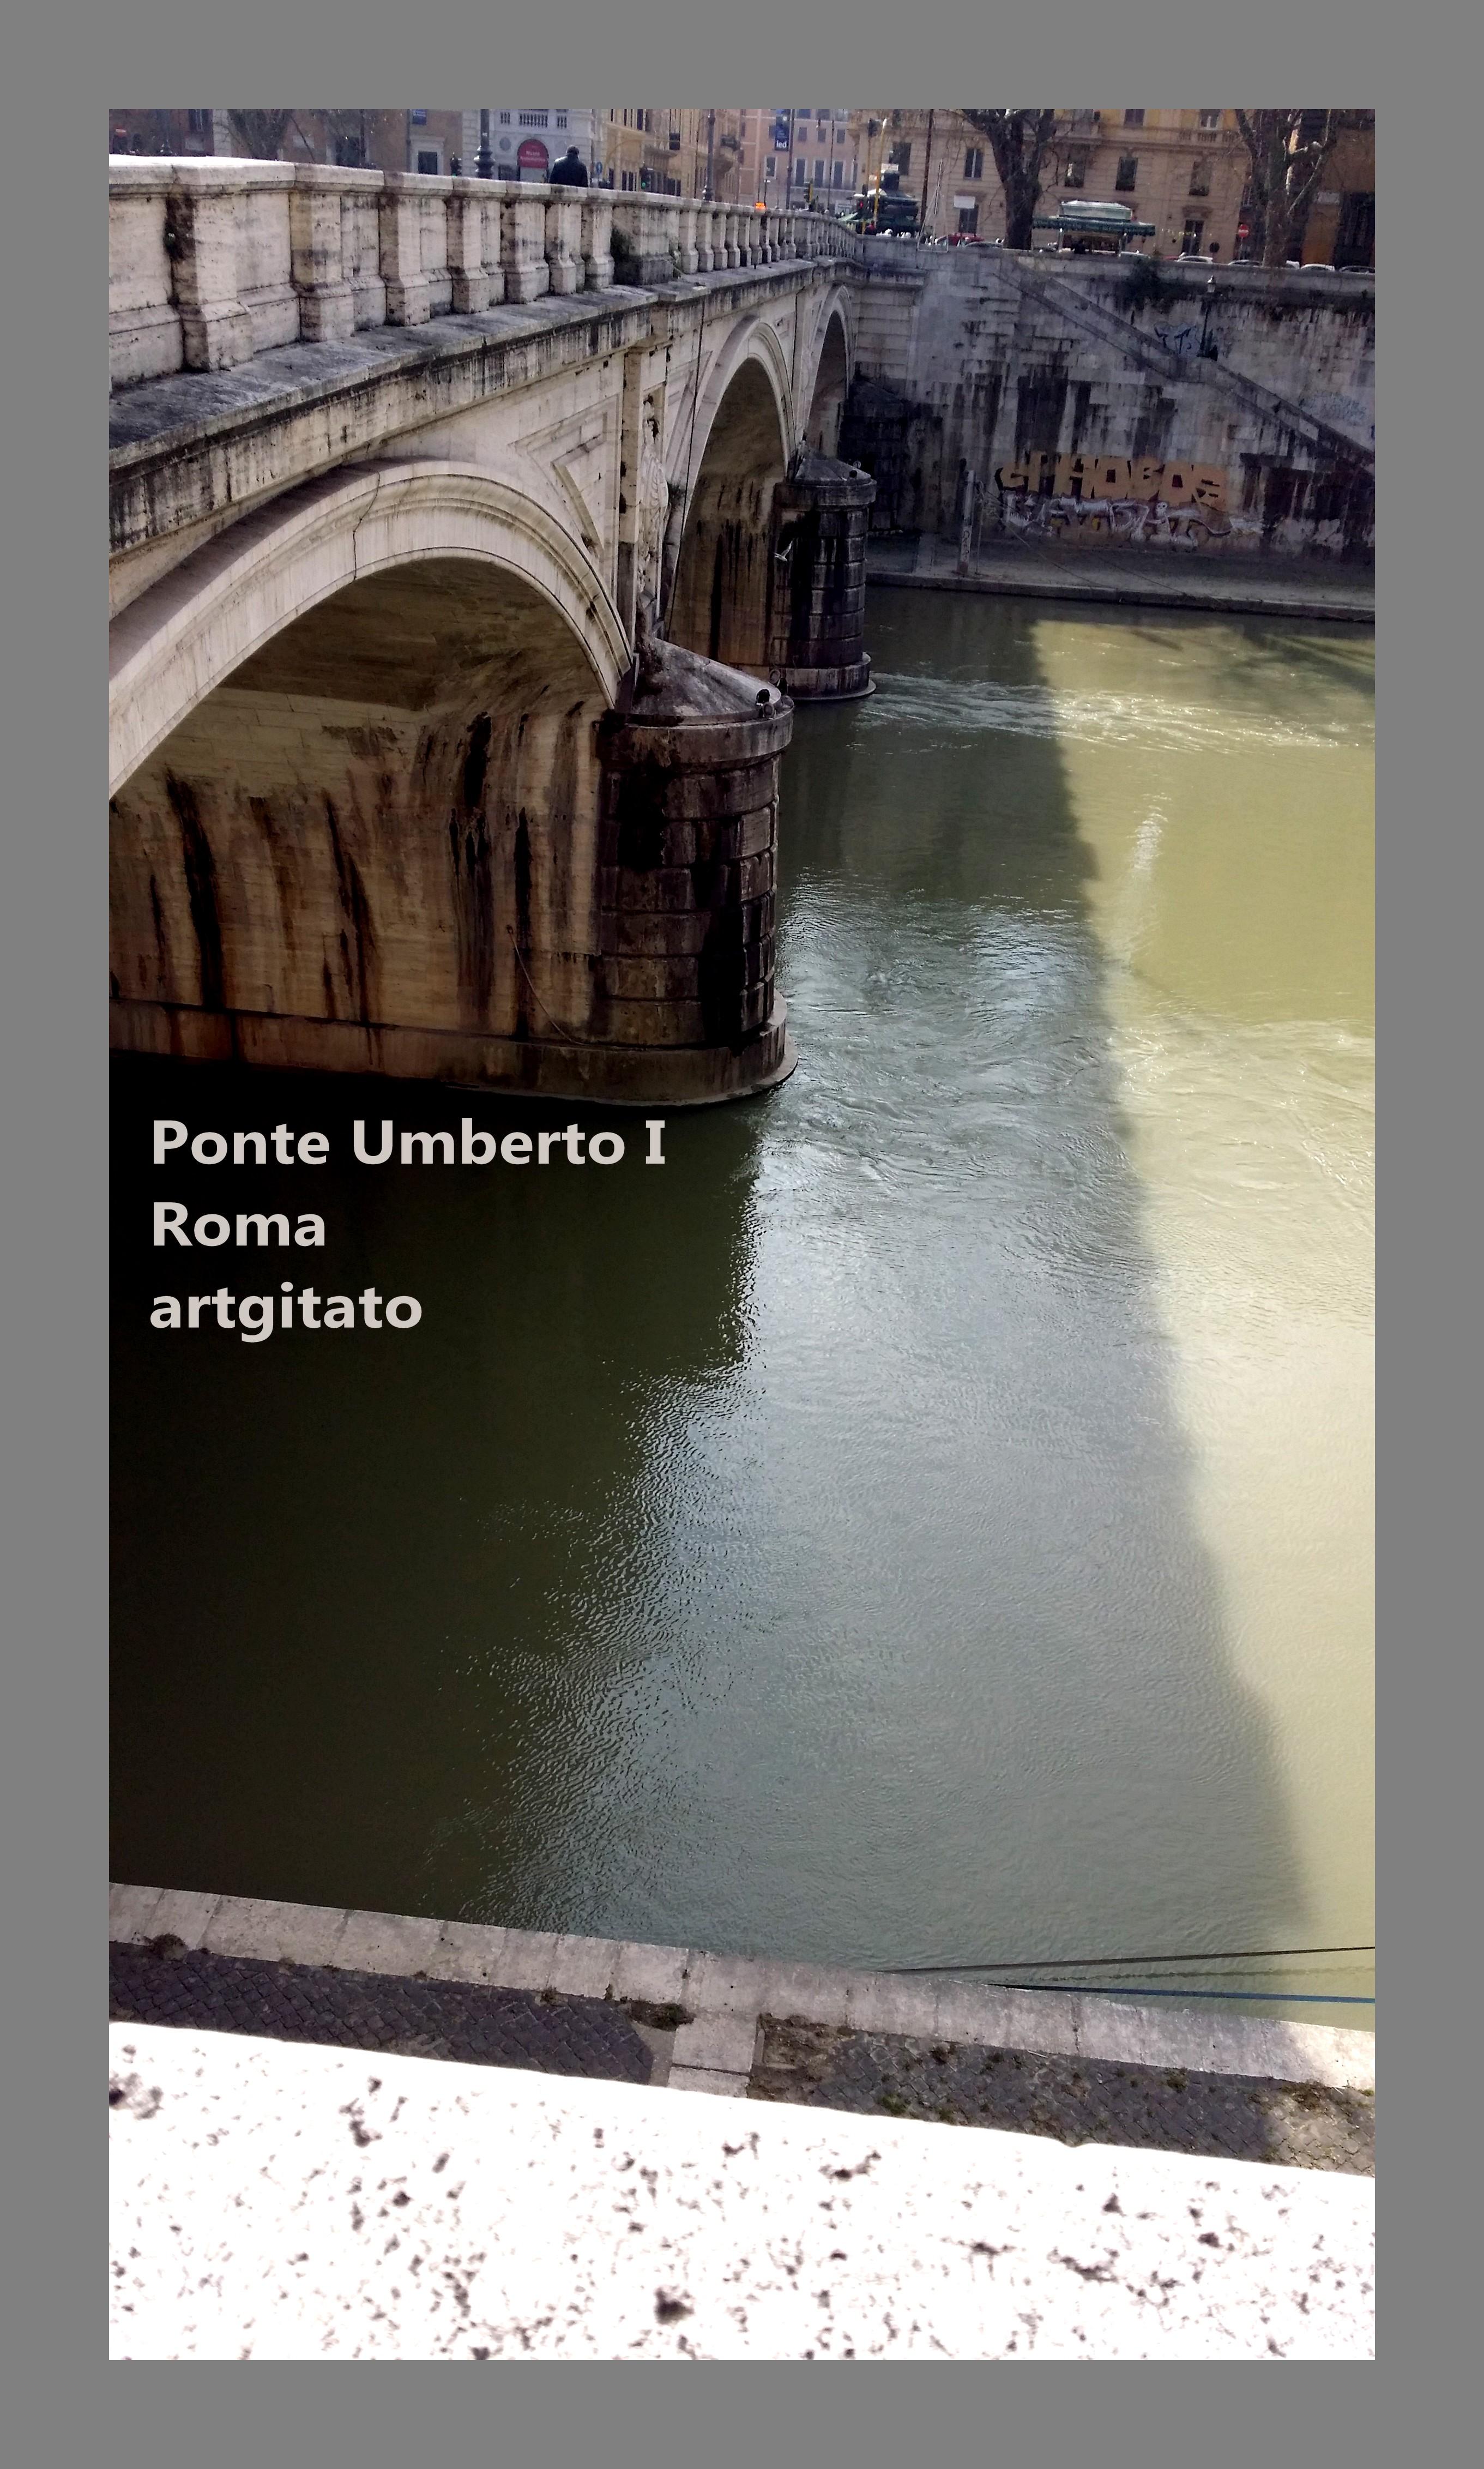 Ponte Umberto I Pont Umberto Ier Artgitato3